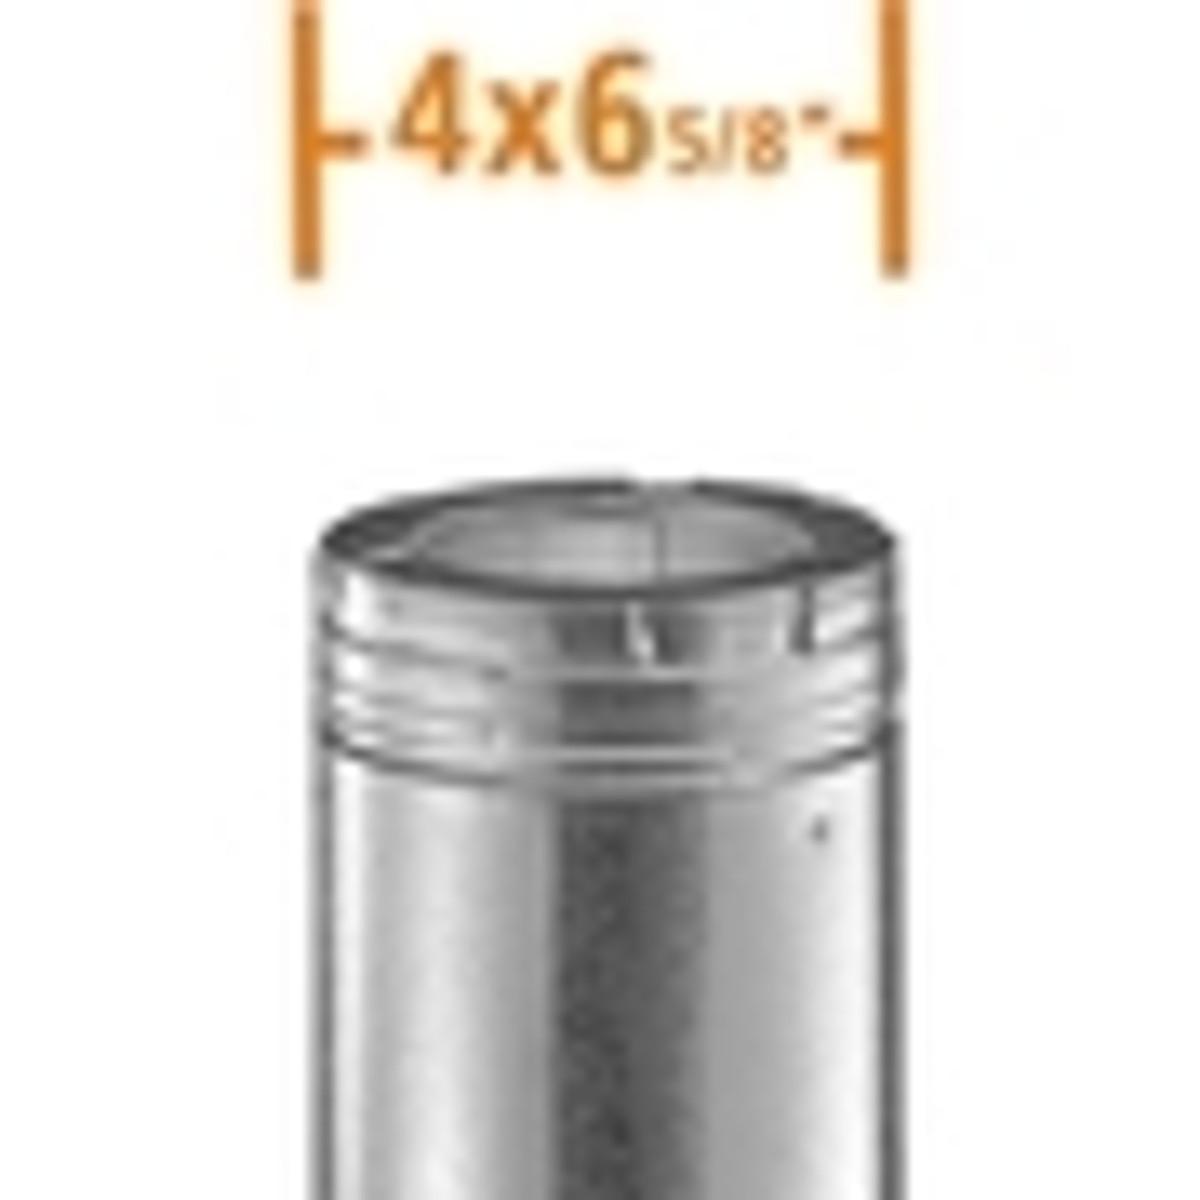 "4"" x 6 5/8"" DuraVent DirectVent Pro Gas Vent Pipe"